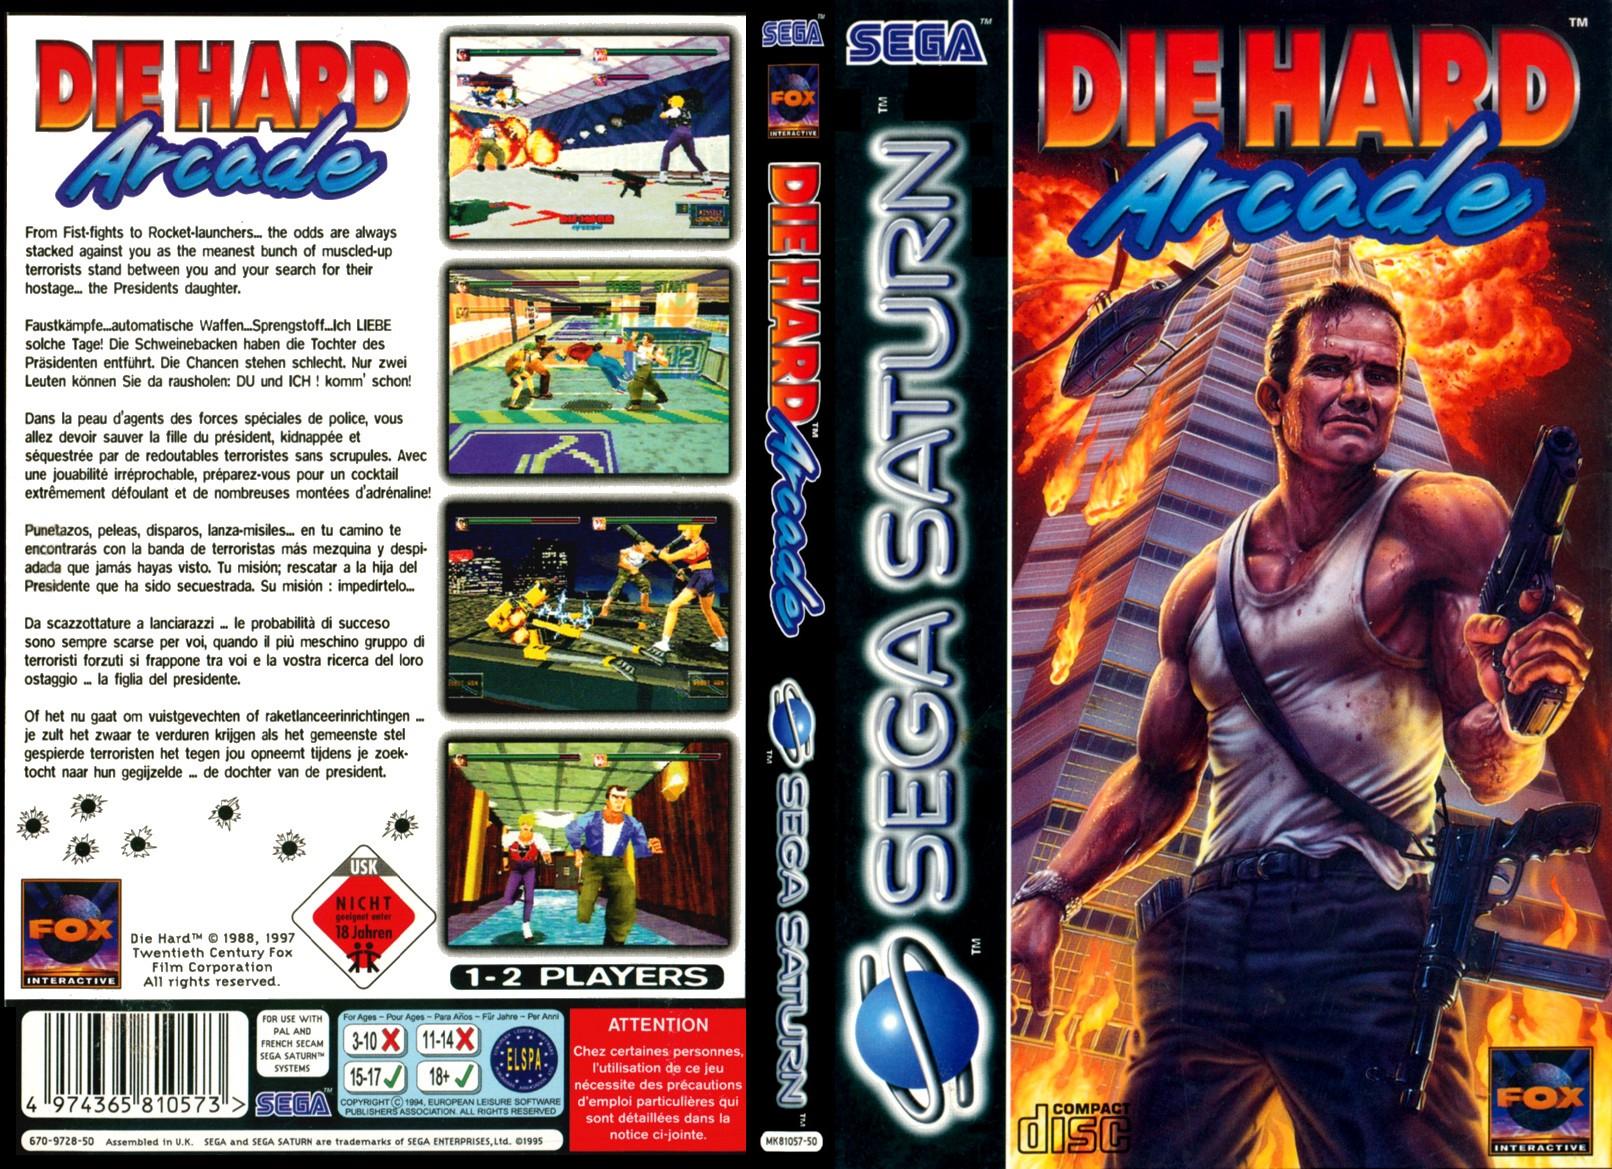 die hard arcade us sega saturn full game free pc, download